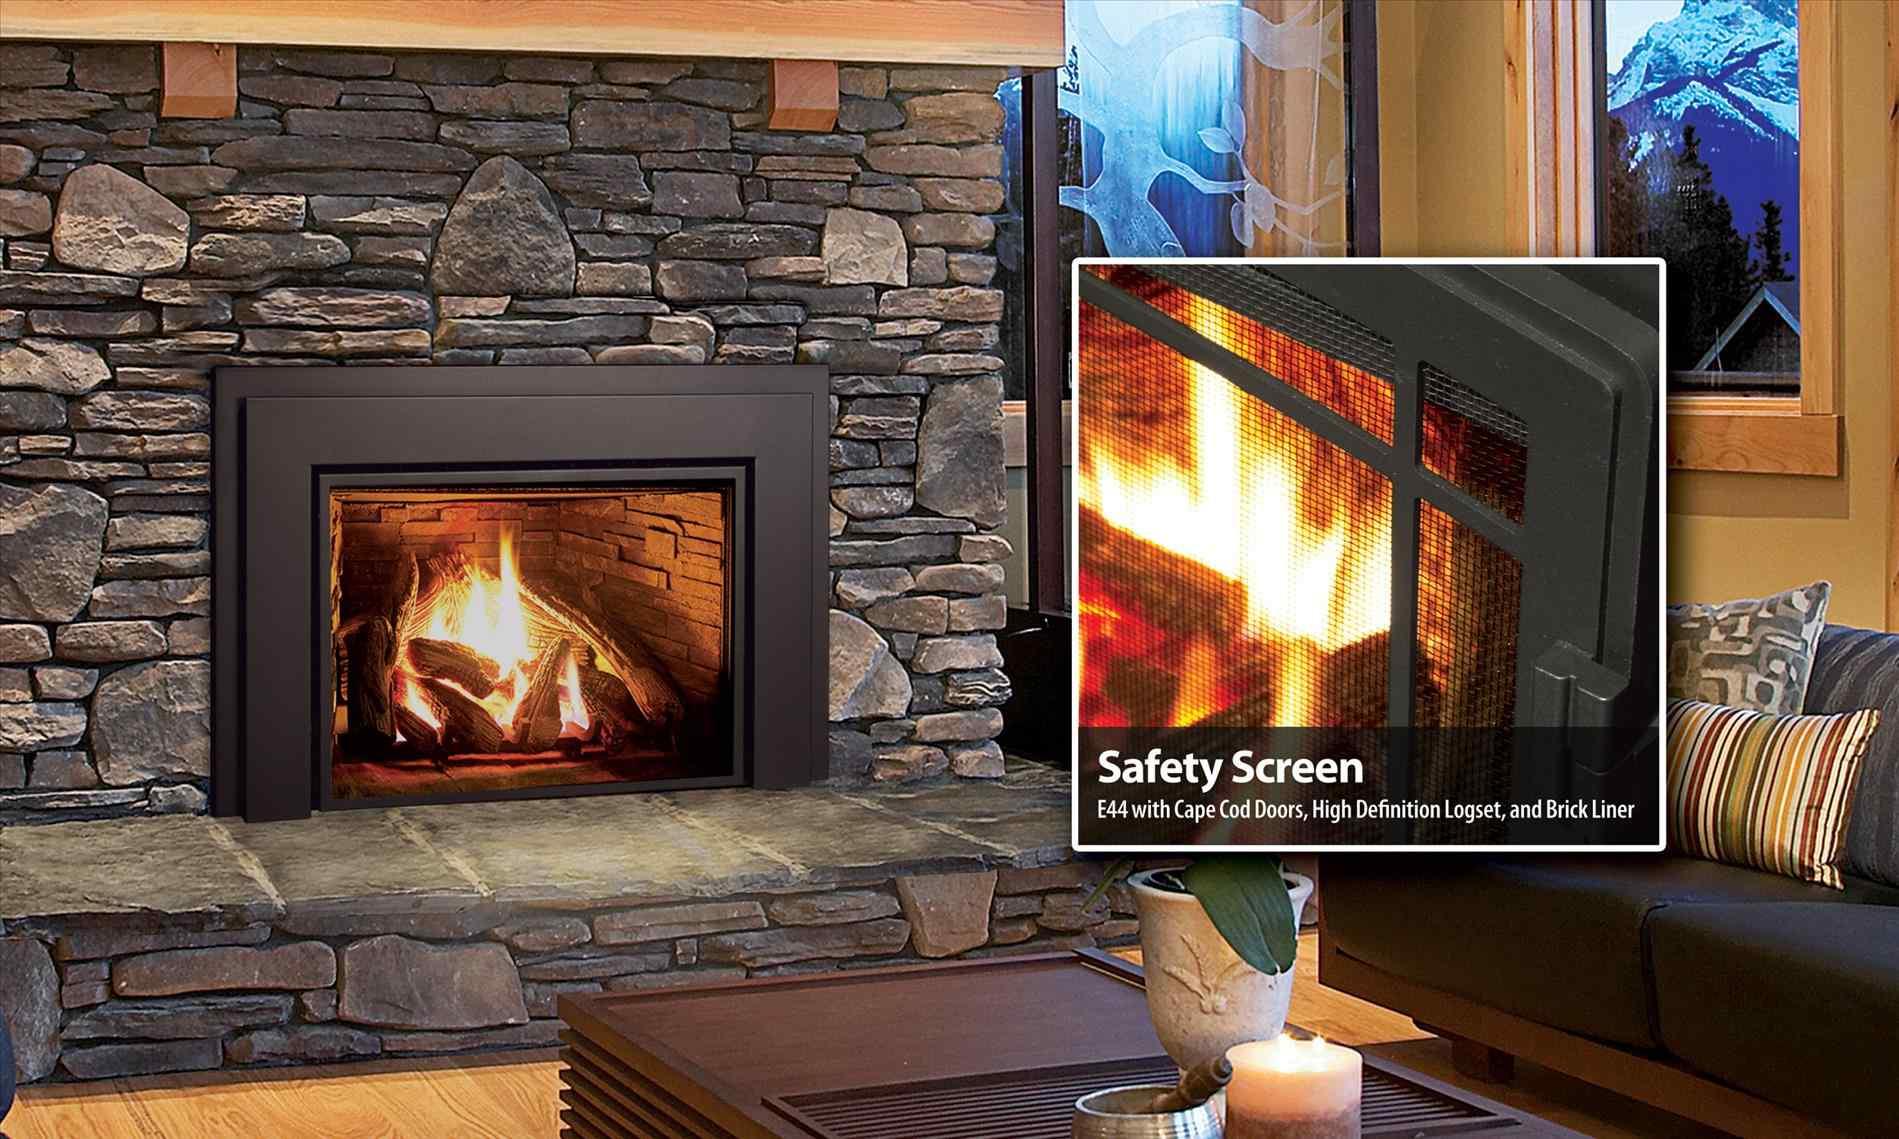 stunning desa international fireplace for your desa gas fireplace troubleshooting fire of desa international fireplace